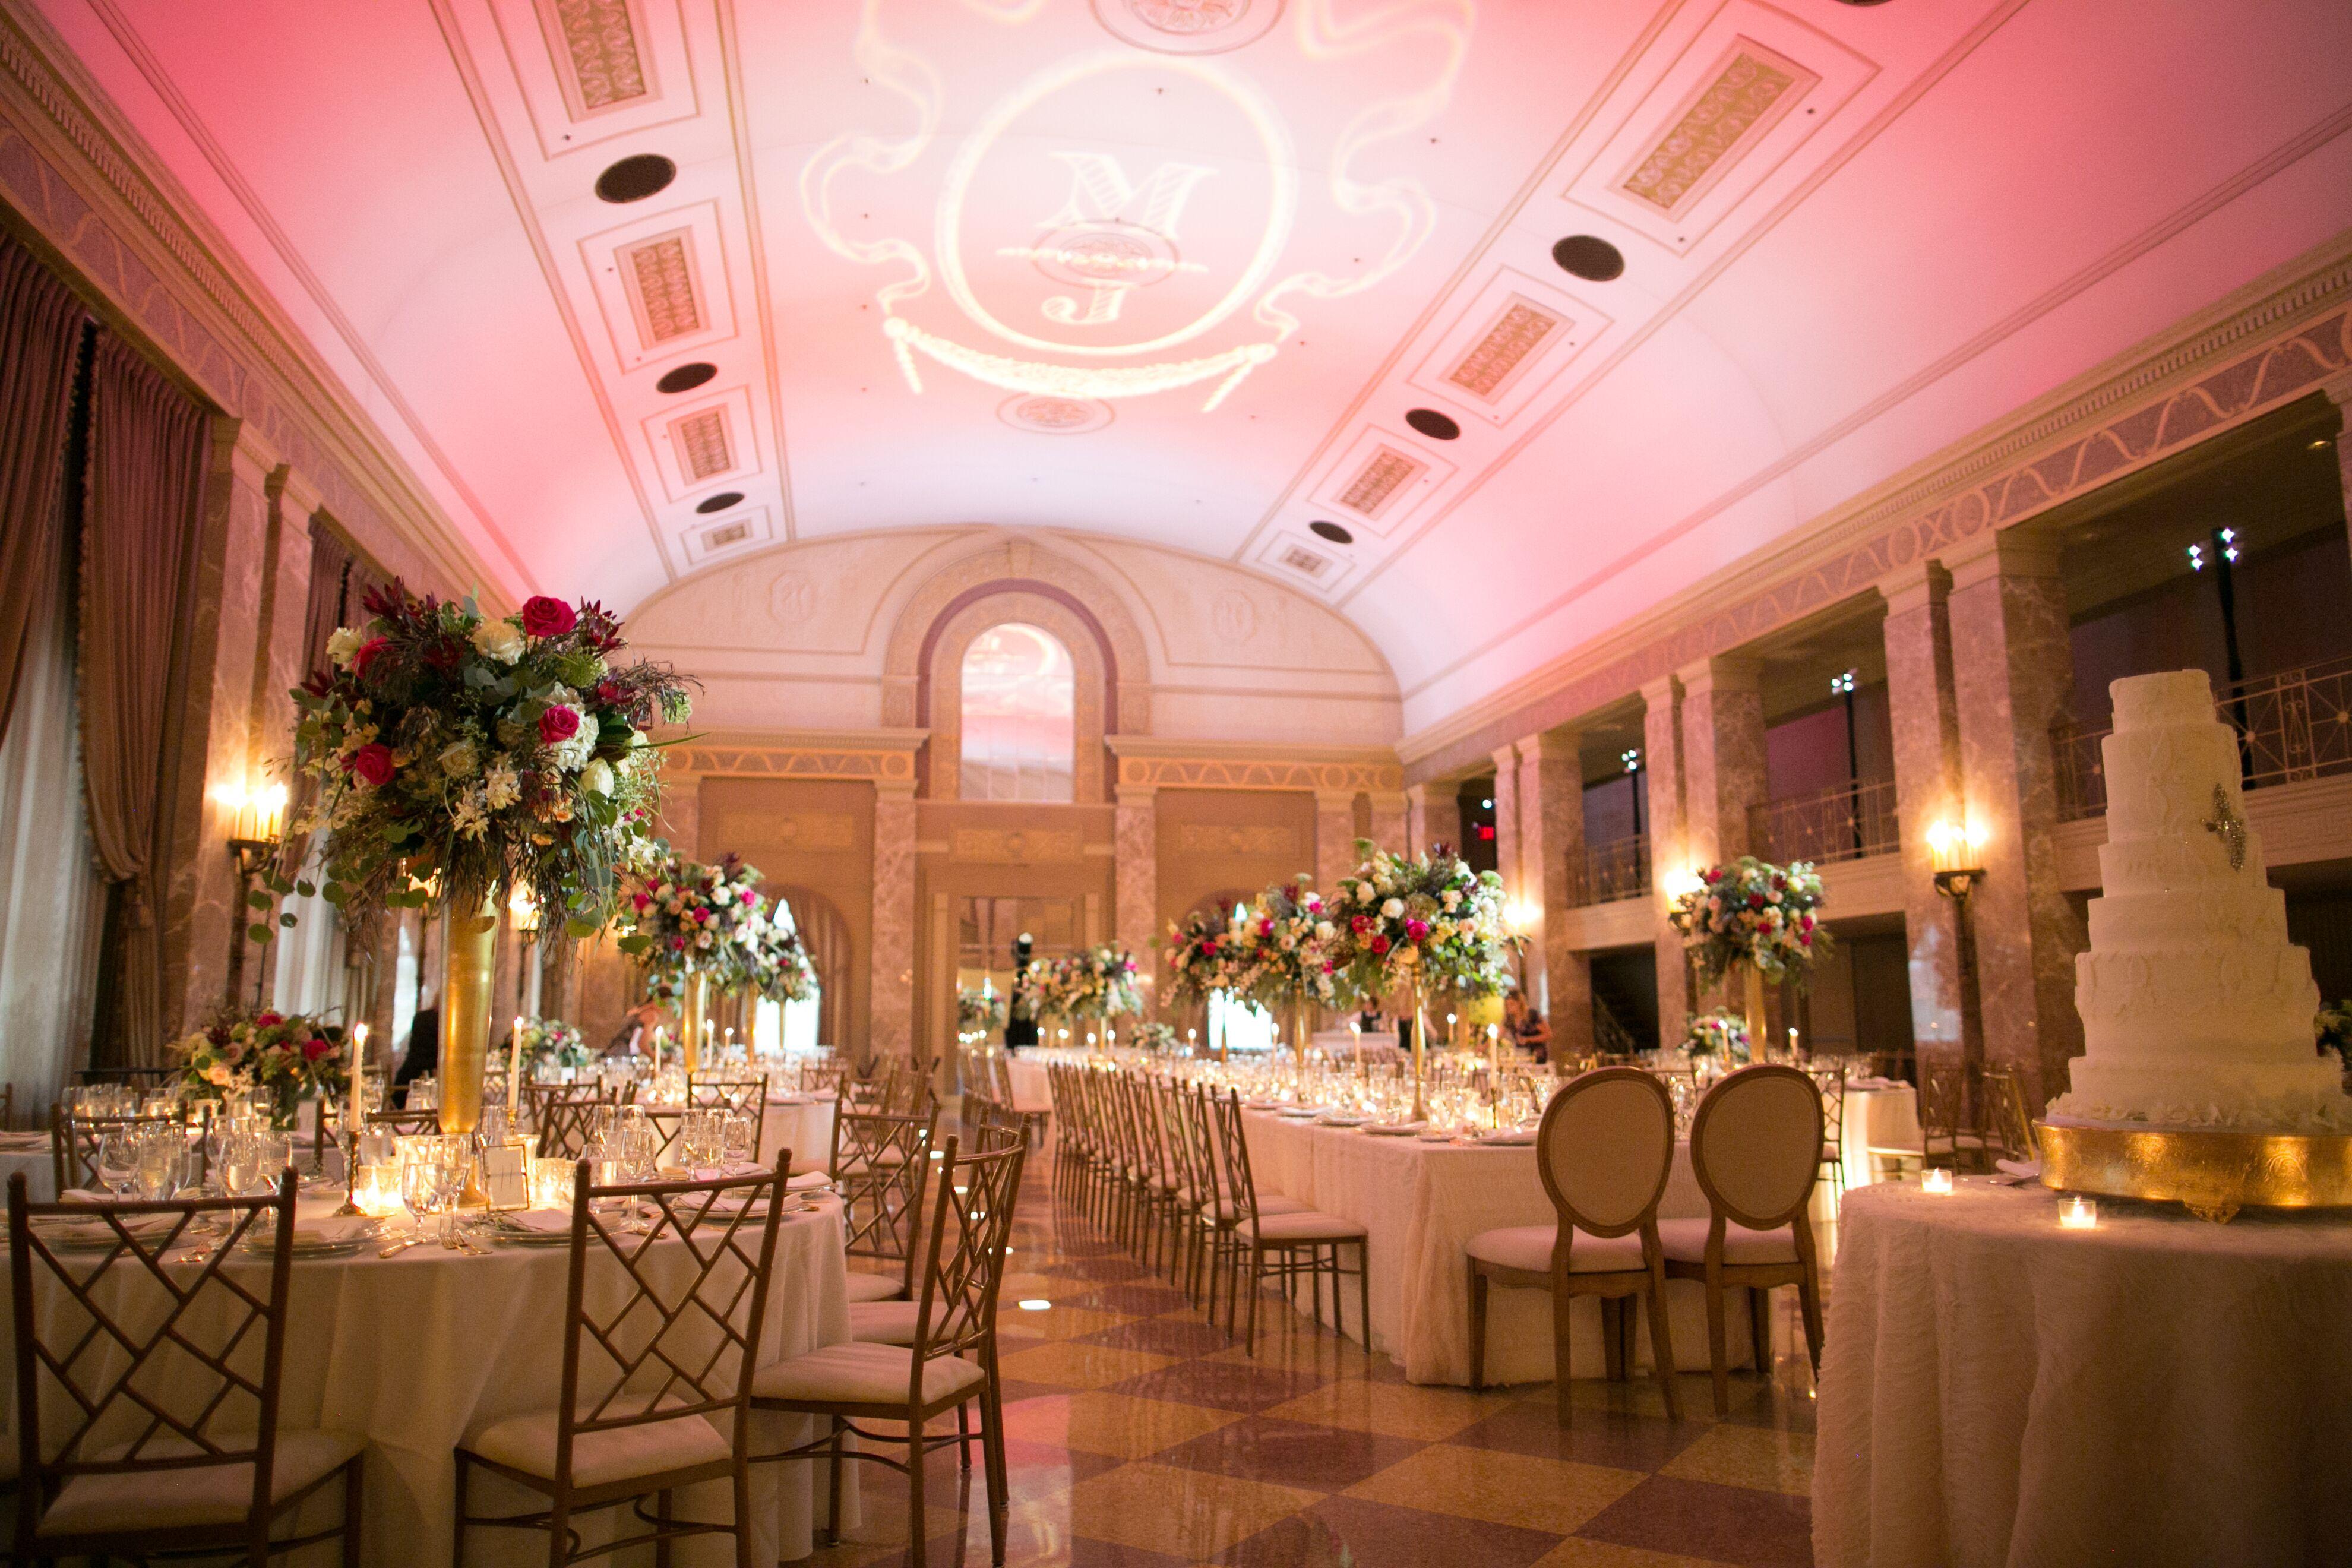 The Coronado Reception Venues Saint Louis Mo